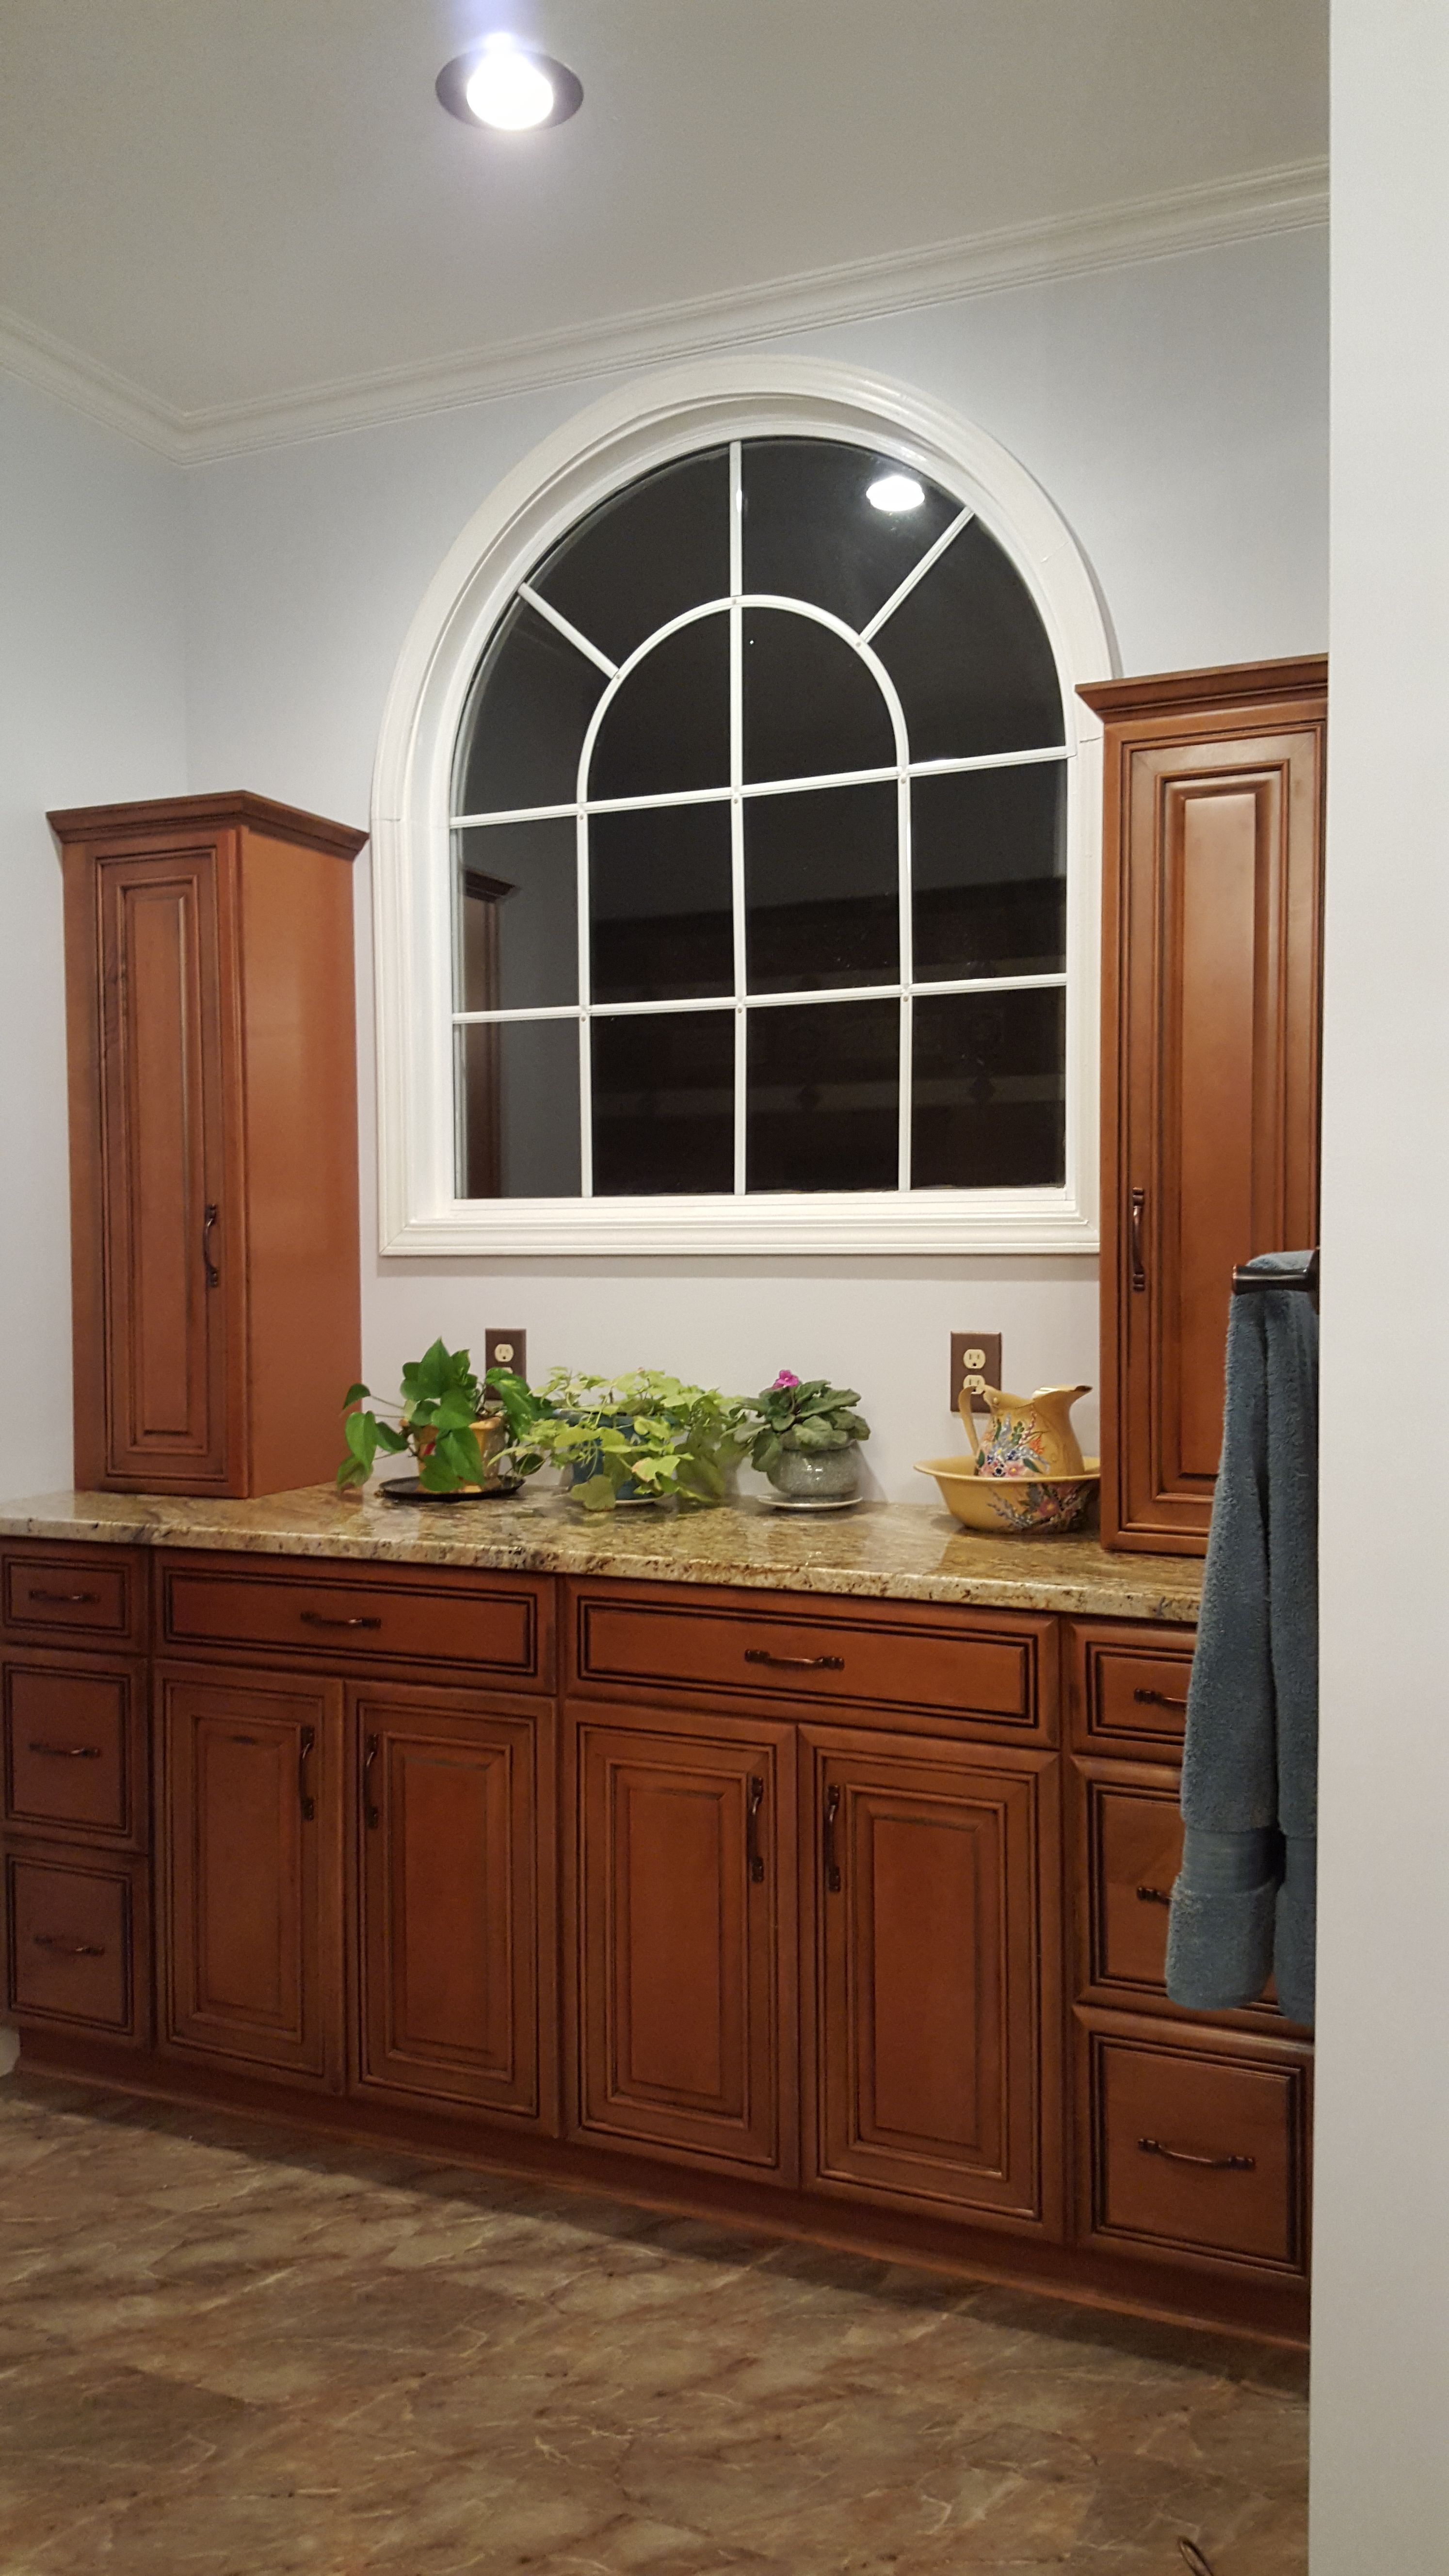 Diamond Whiskey Black Maple Cabinets (Loweu0027s)...Yellow River Granite  Countertop (